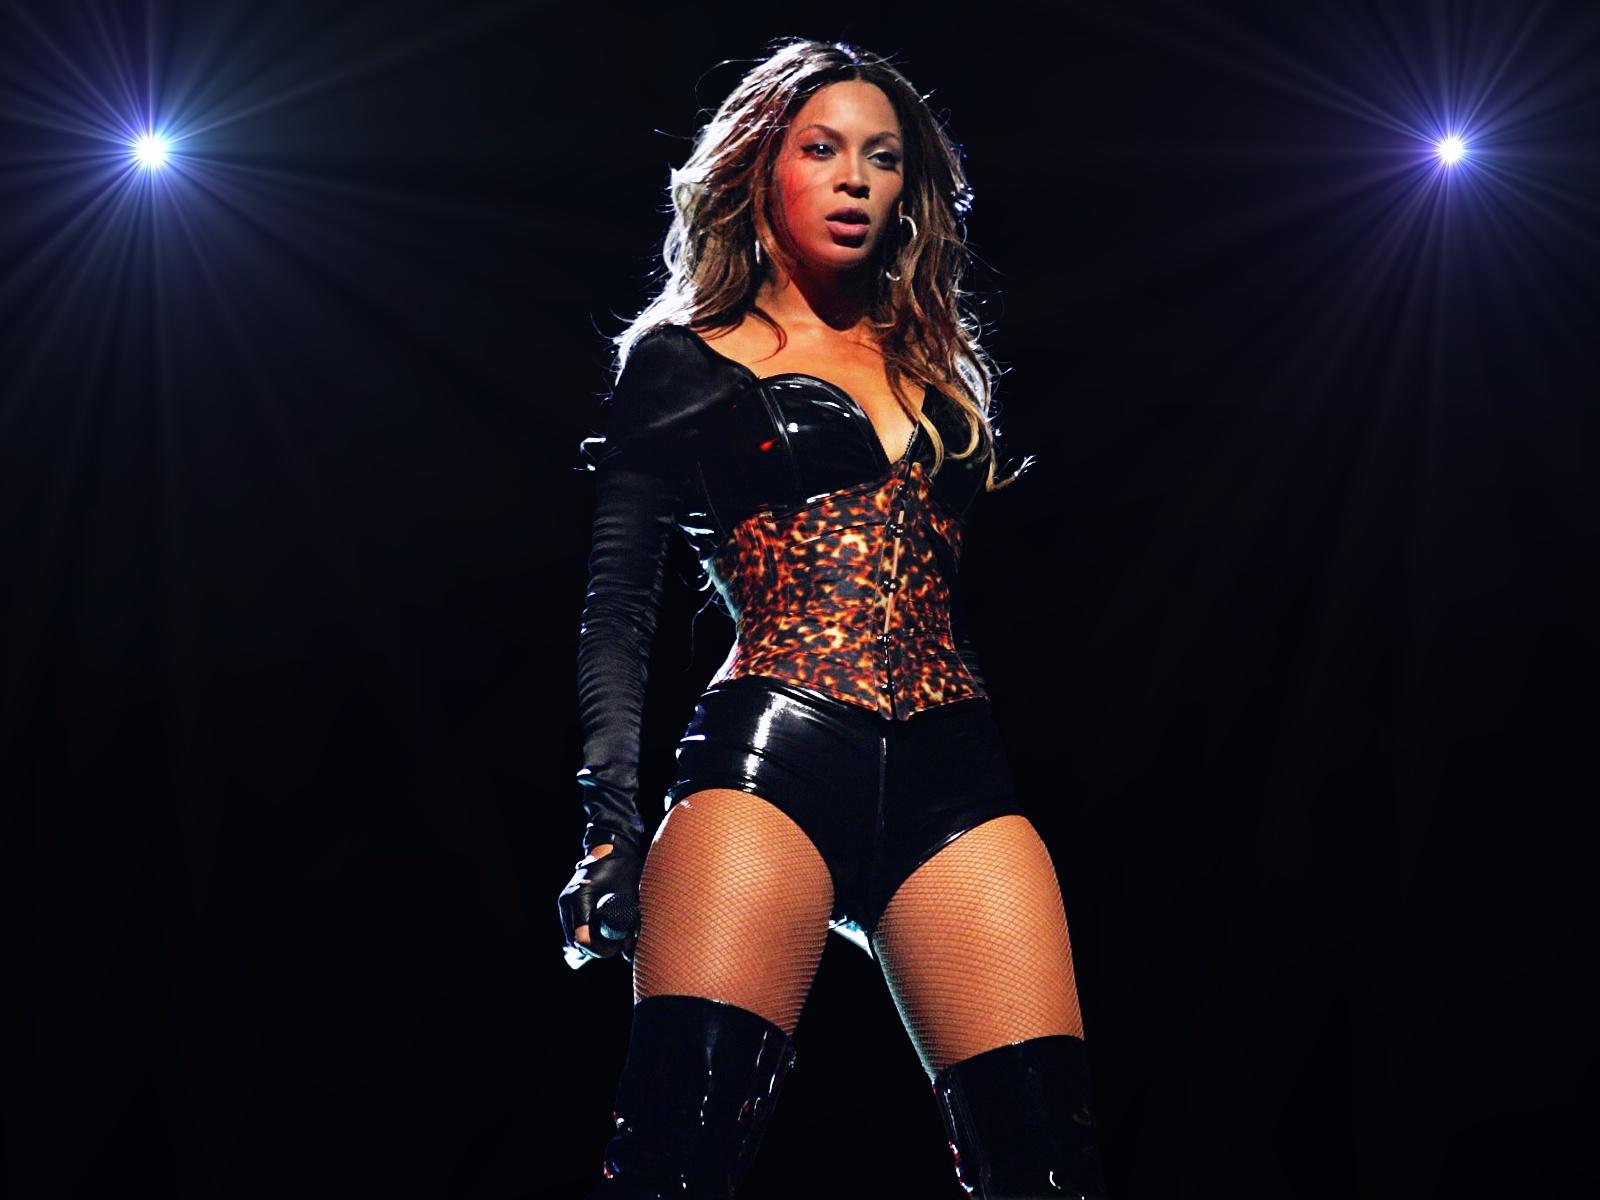 http://4.bp.blogspot.com/-zcXgsM6TBN4/T8GjX4URGnI/AAAAAAAAAho/kLZjJcRH0Qk/s1600/Beyonce_01wp-lg.jpg